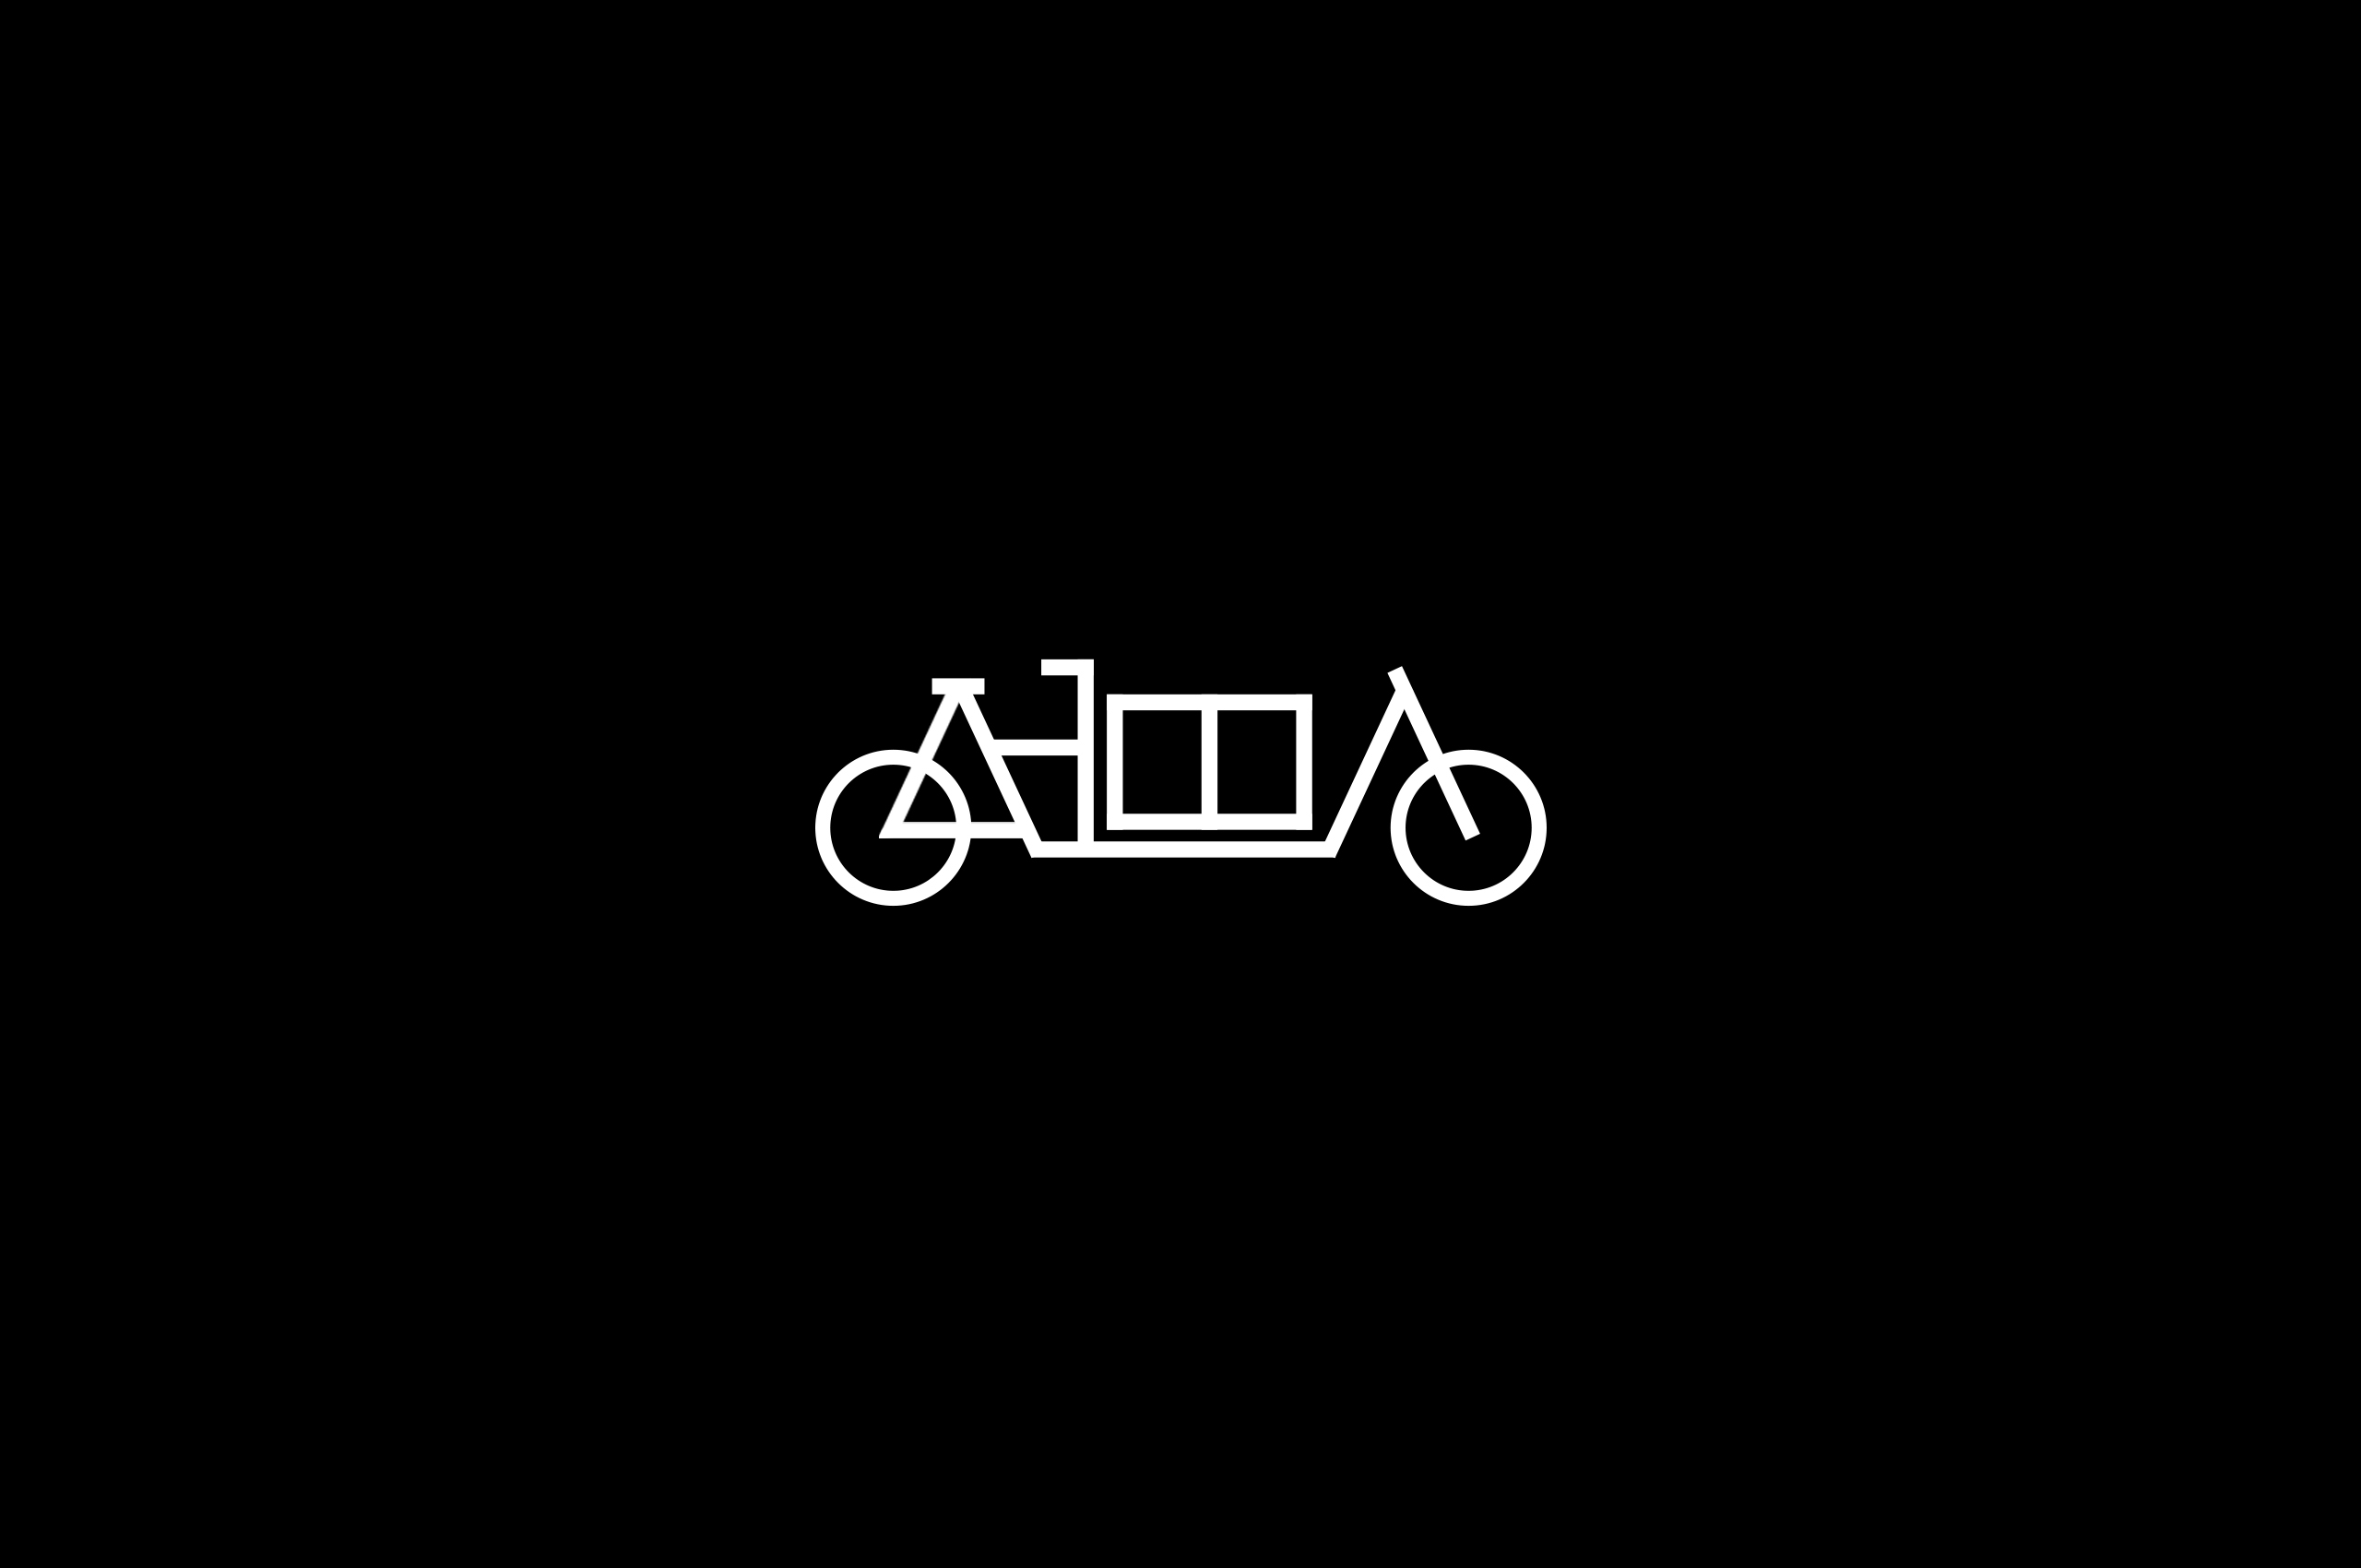 logo-28-black